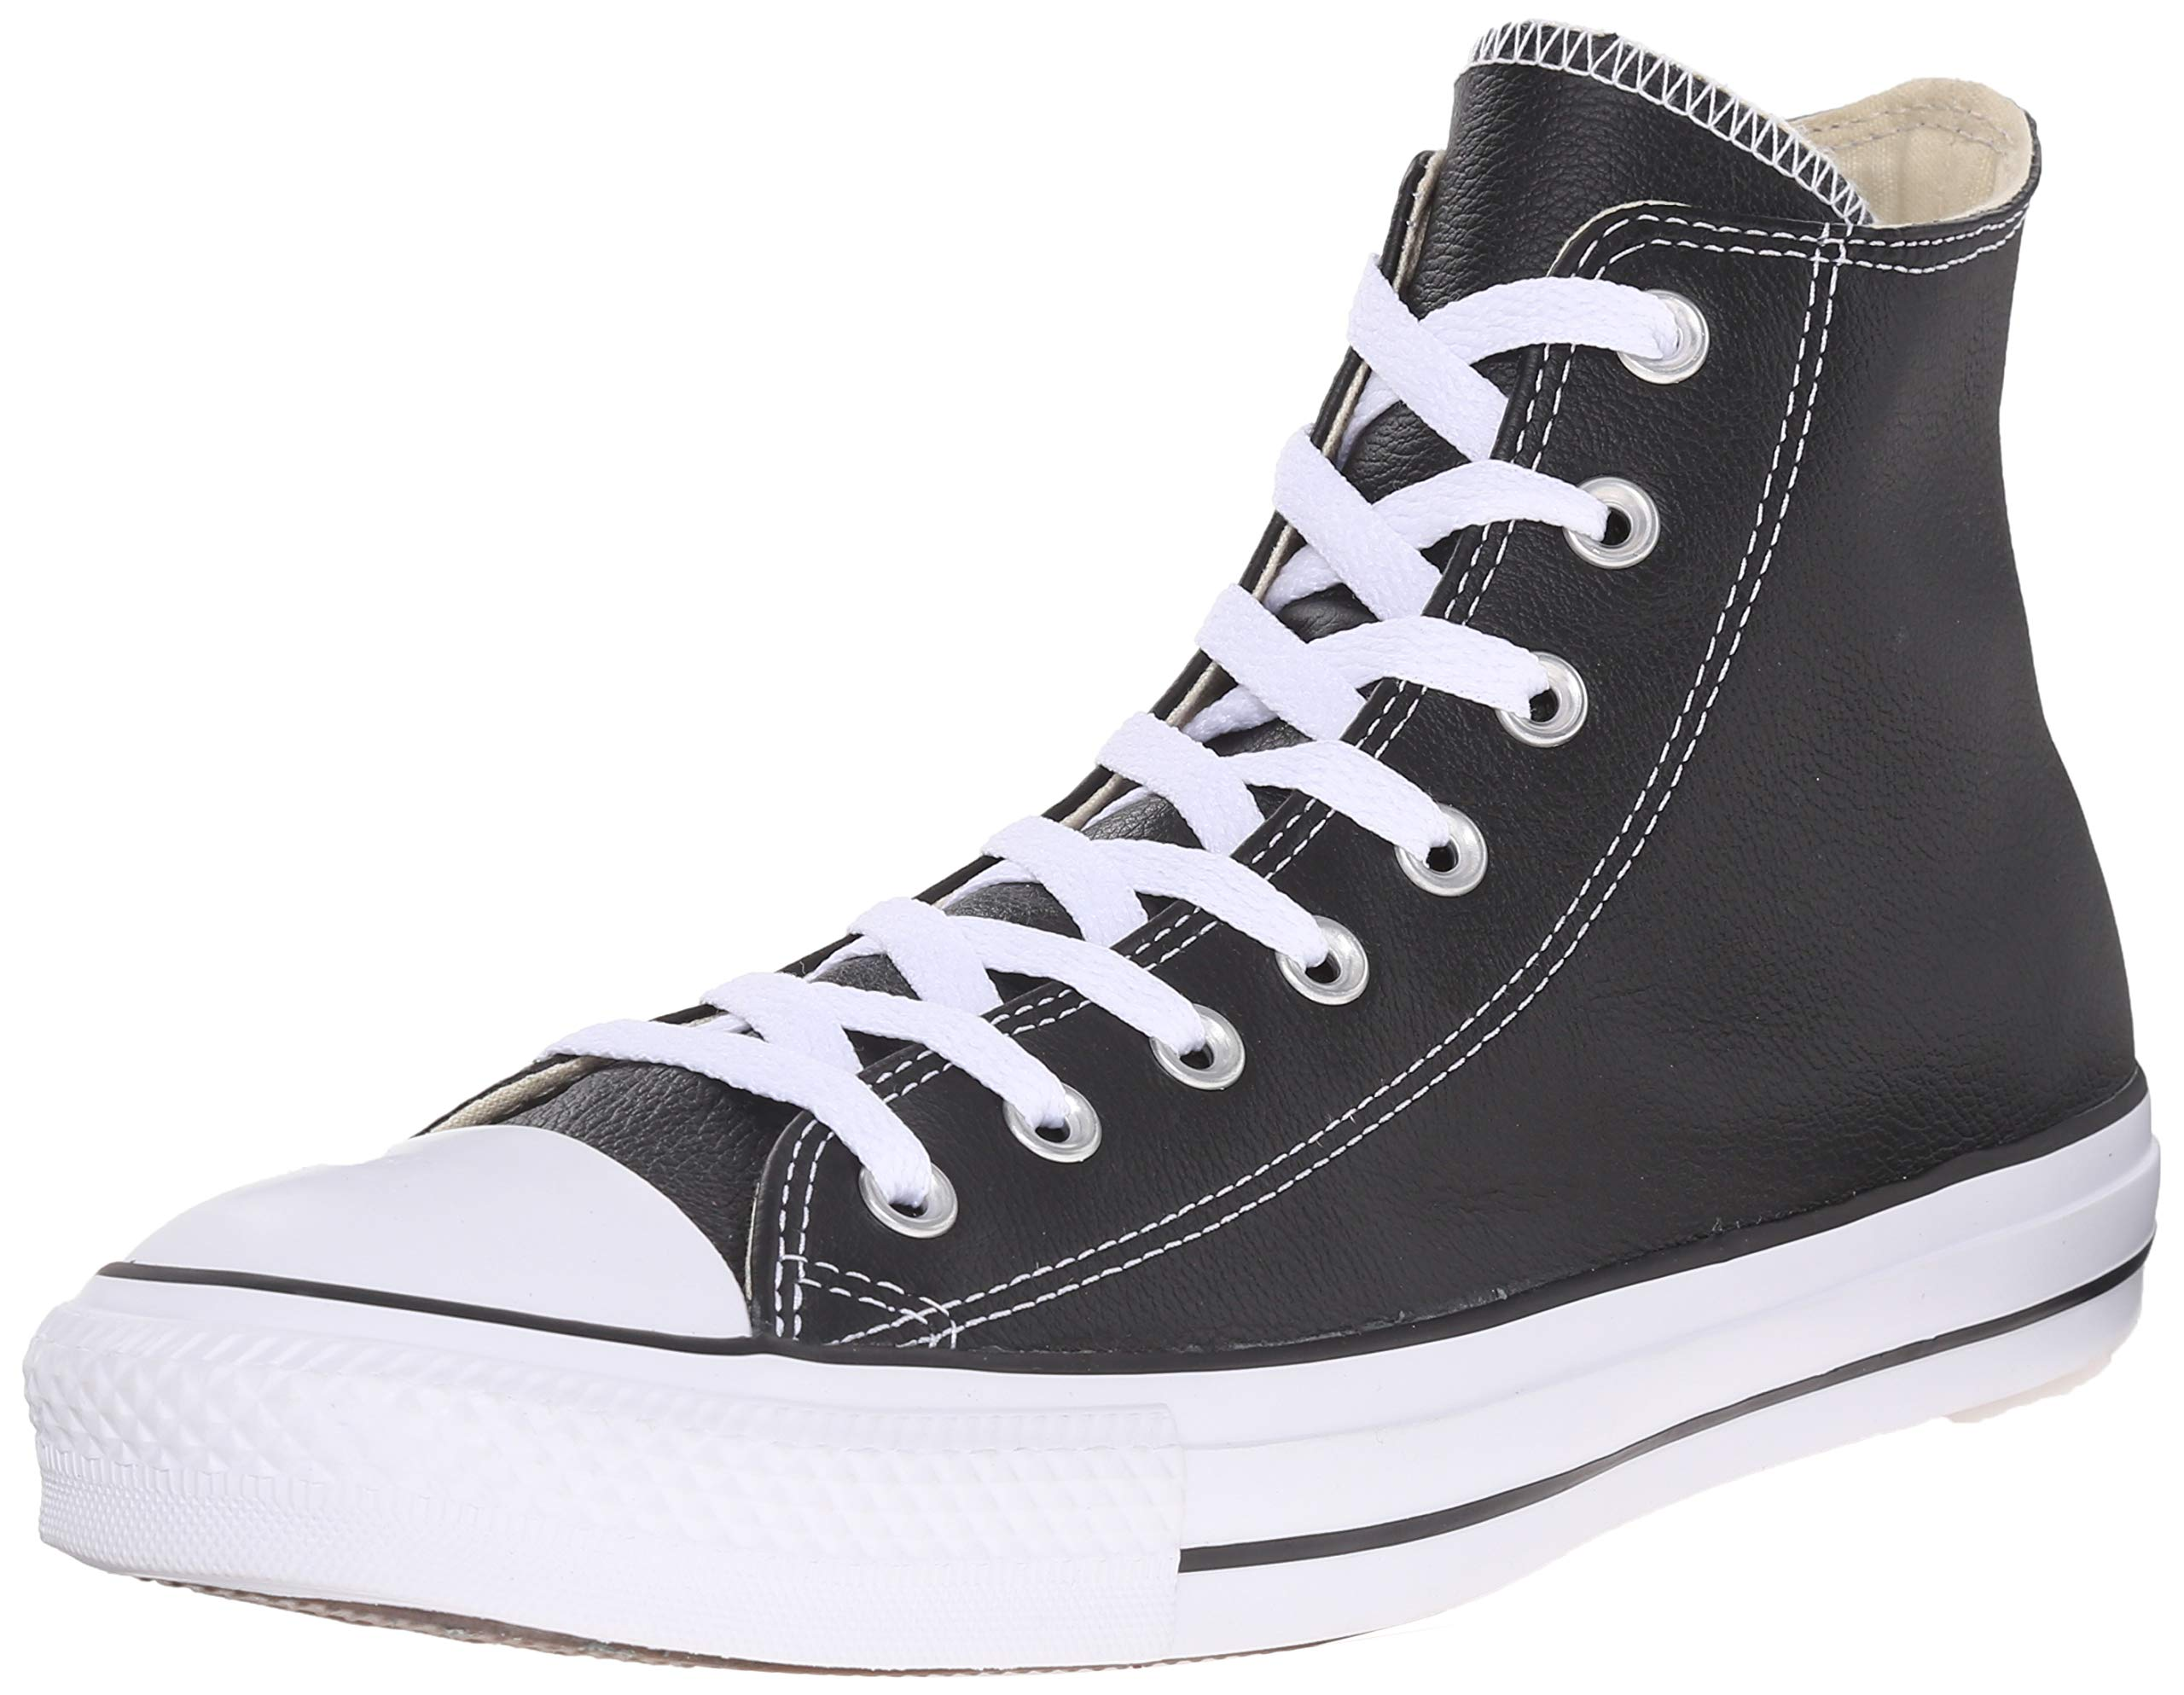 Converse Unisex Chuck Taylor Hi Black Basketball Shoe 11.5 Men US / 13.5 Women US by Converse